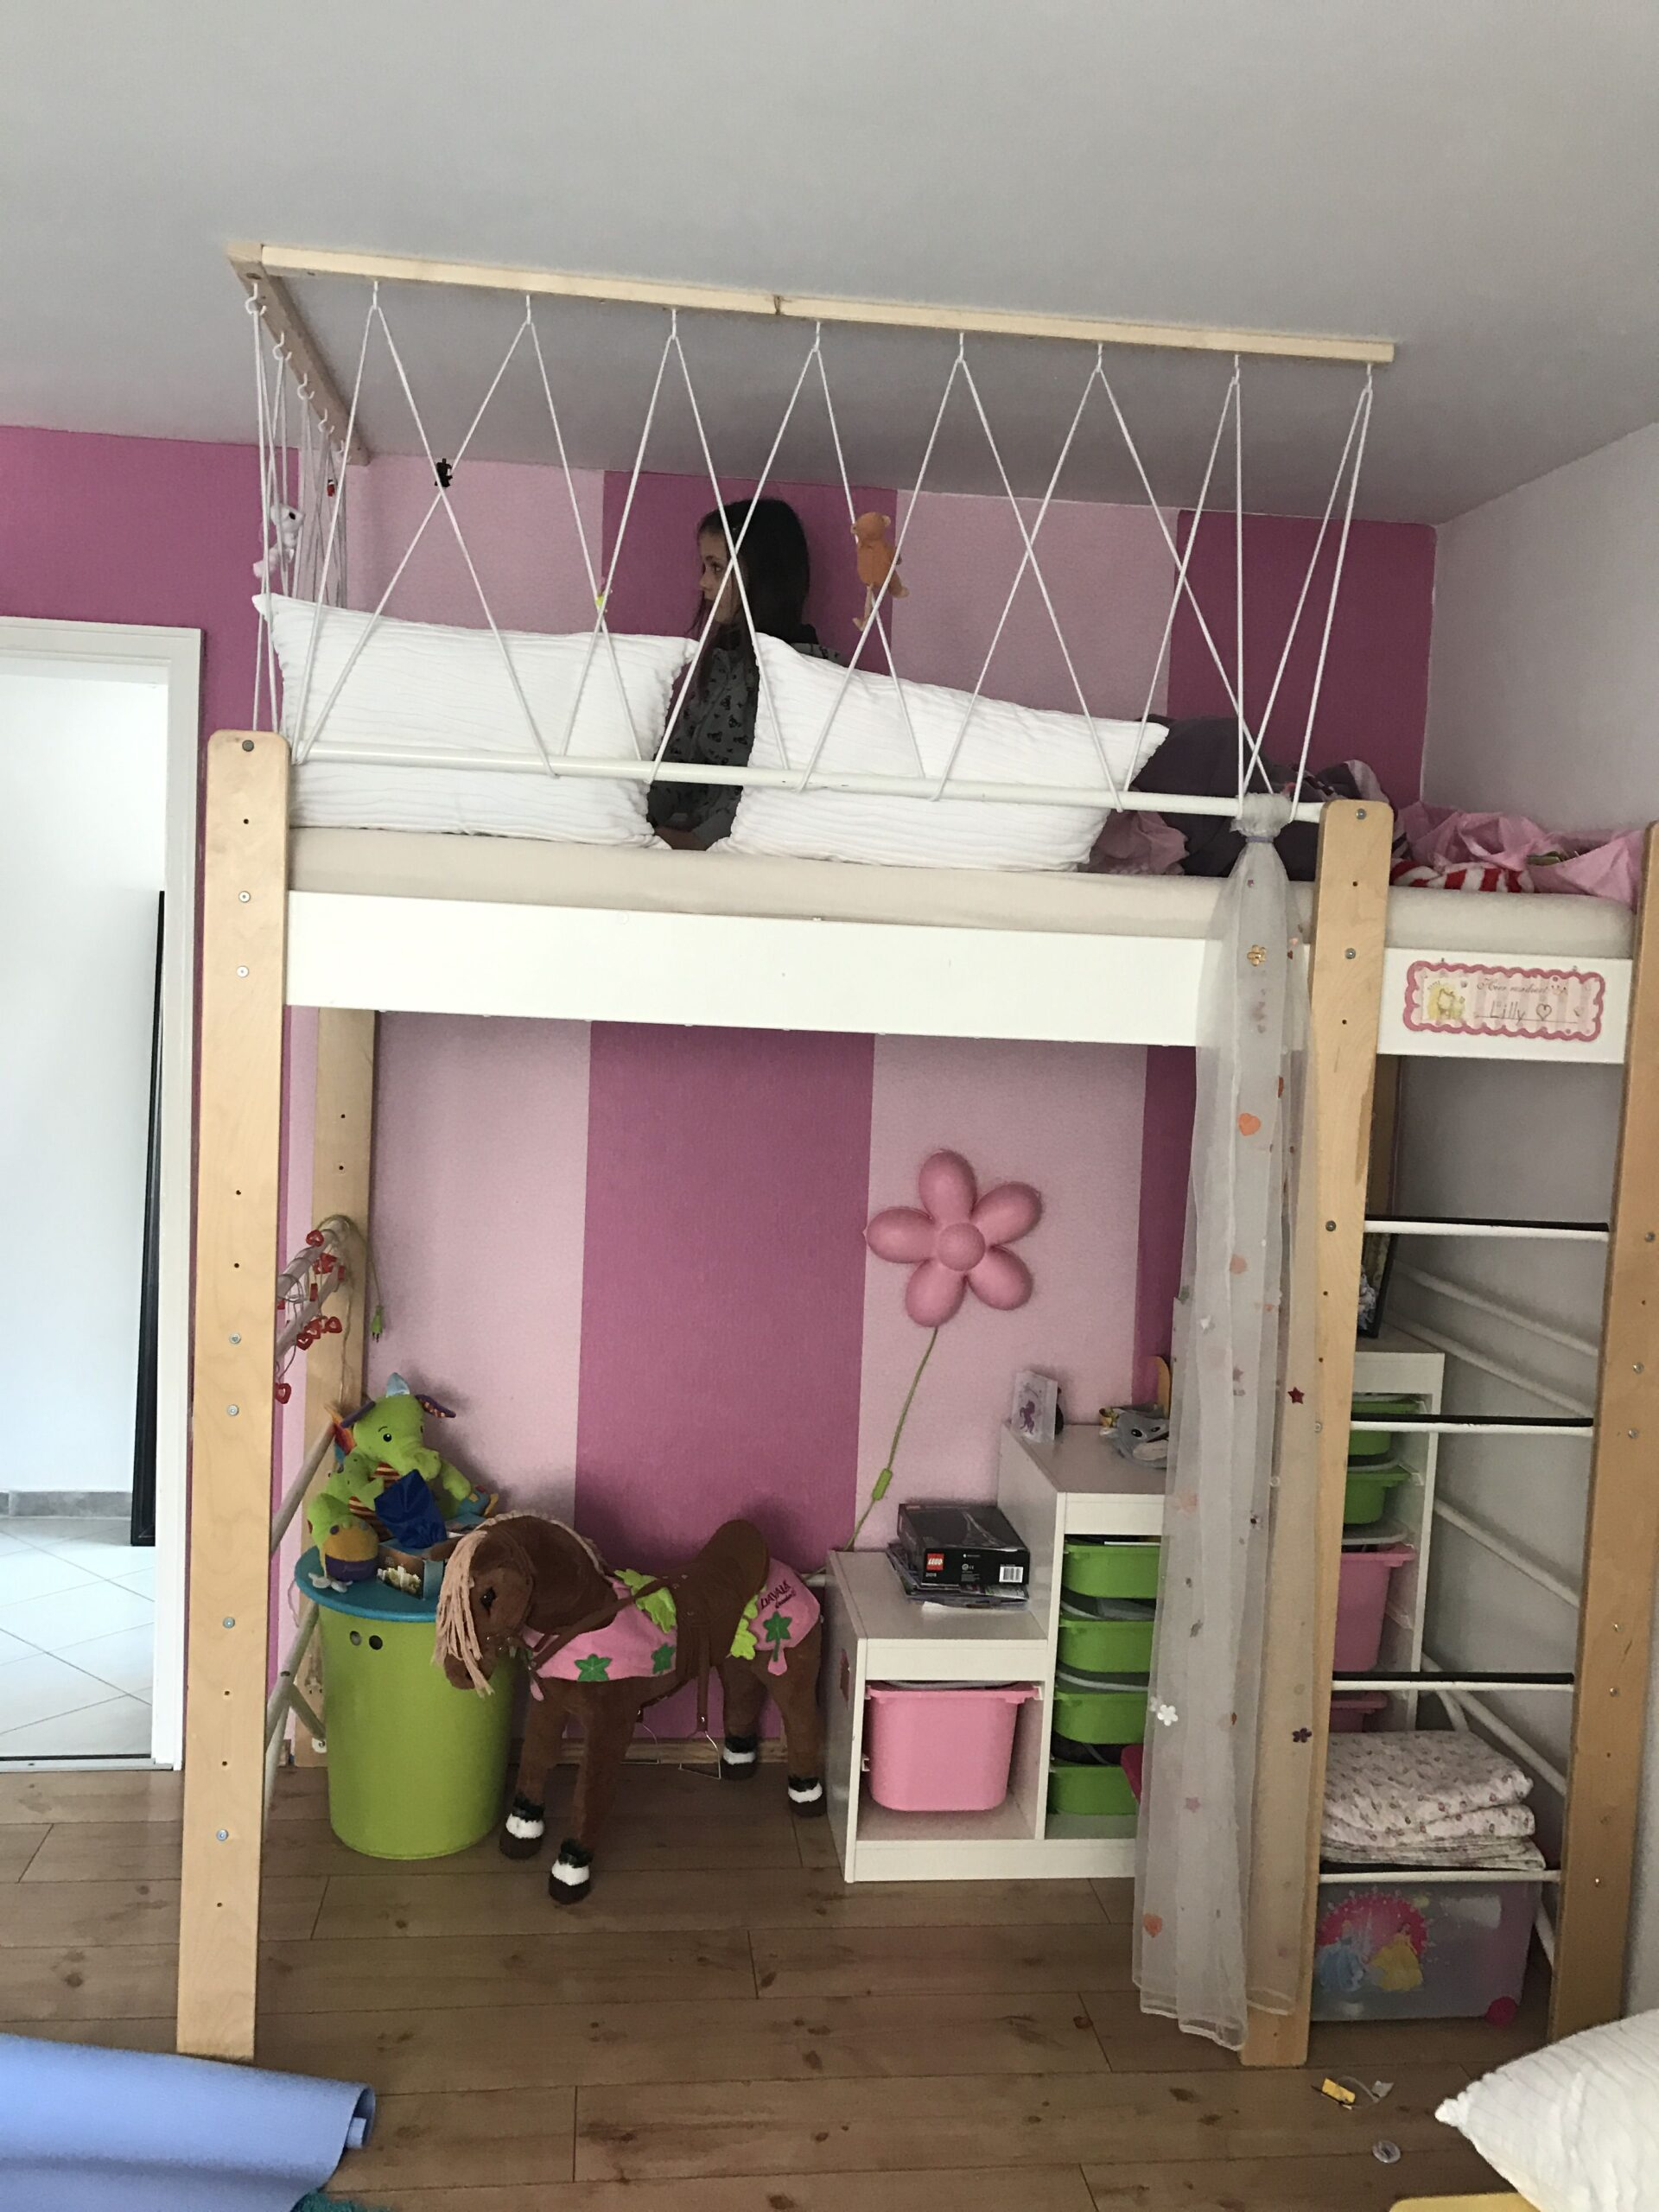 Full Size of Hochbett Mit Schrank Dolphin Holzturm Wei Textilien Regal Kinderzimmer Weiß Sofa Regale Kinderzimmer Kinderzimmer Hochbett